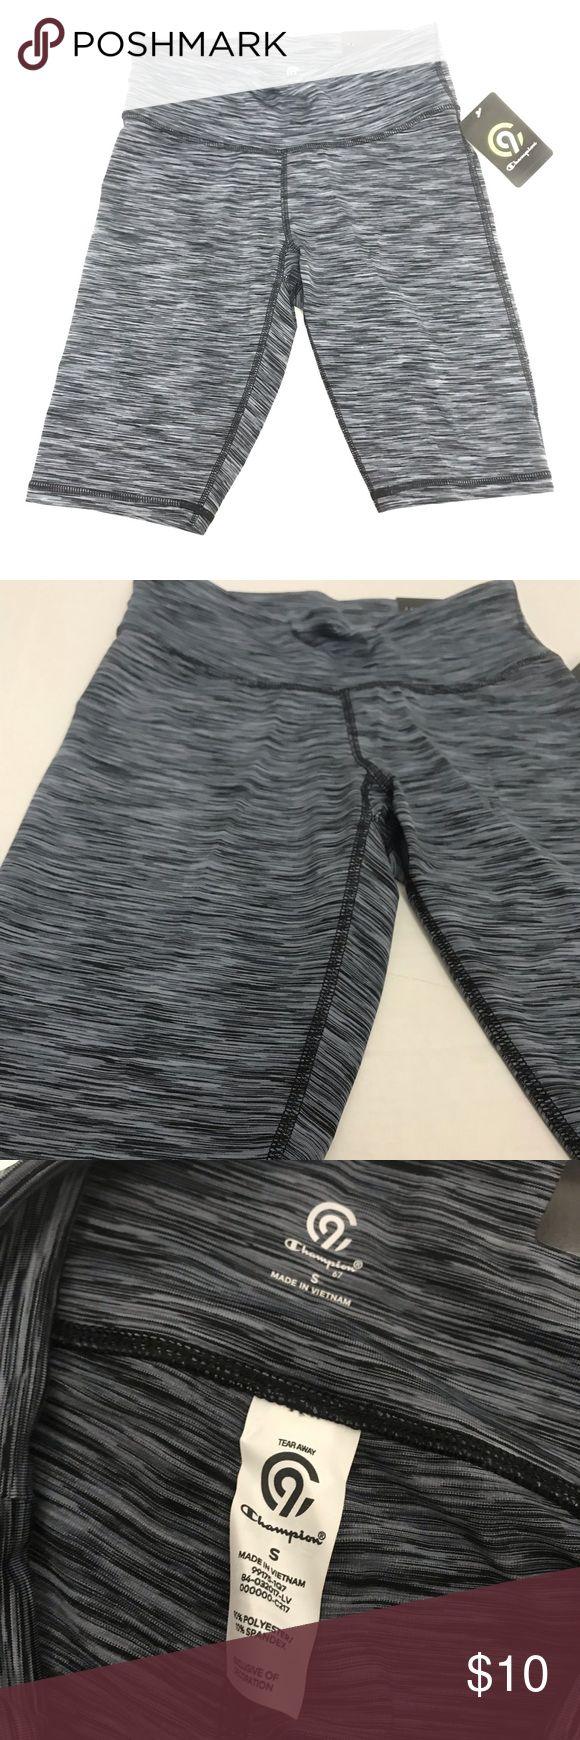 NWT! Champion | Target  Mid Rise Biker Shorts SZ S Target for Champion grey mid-…  – My Posh Closet